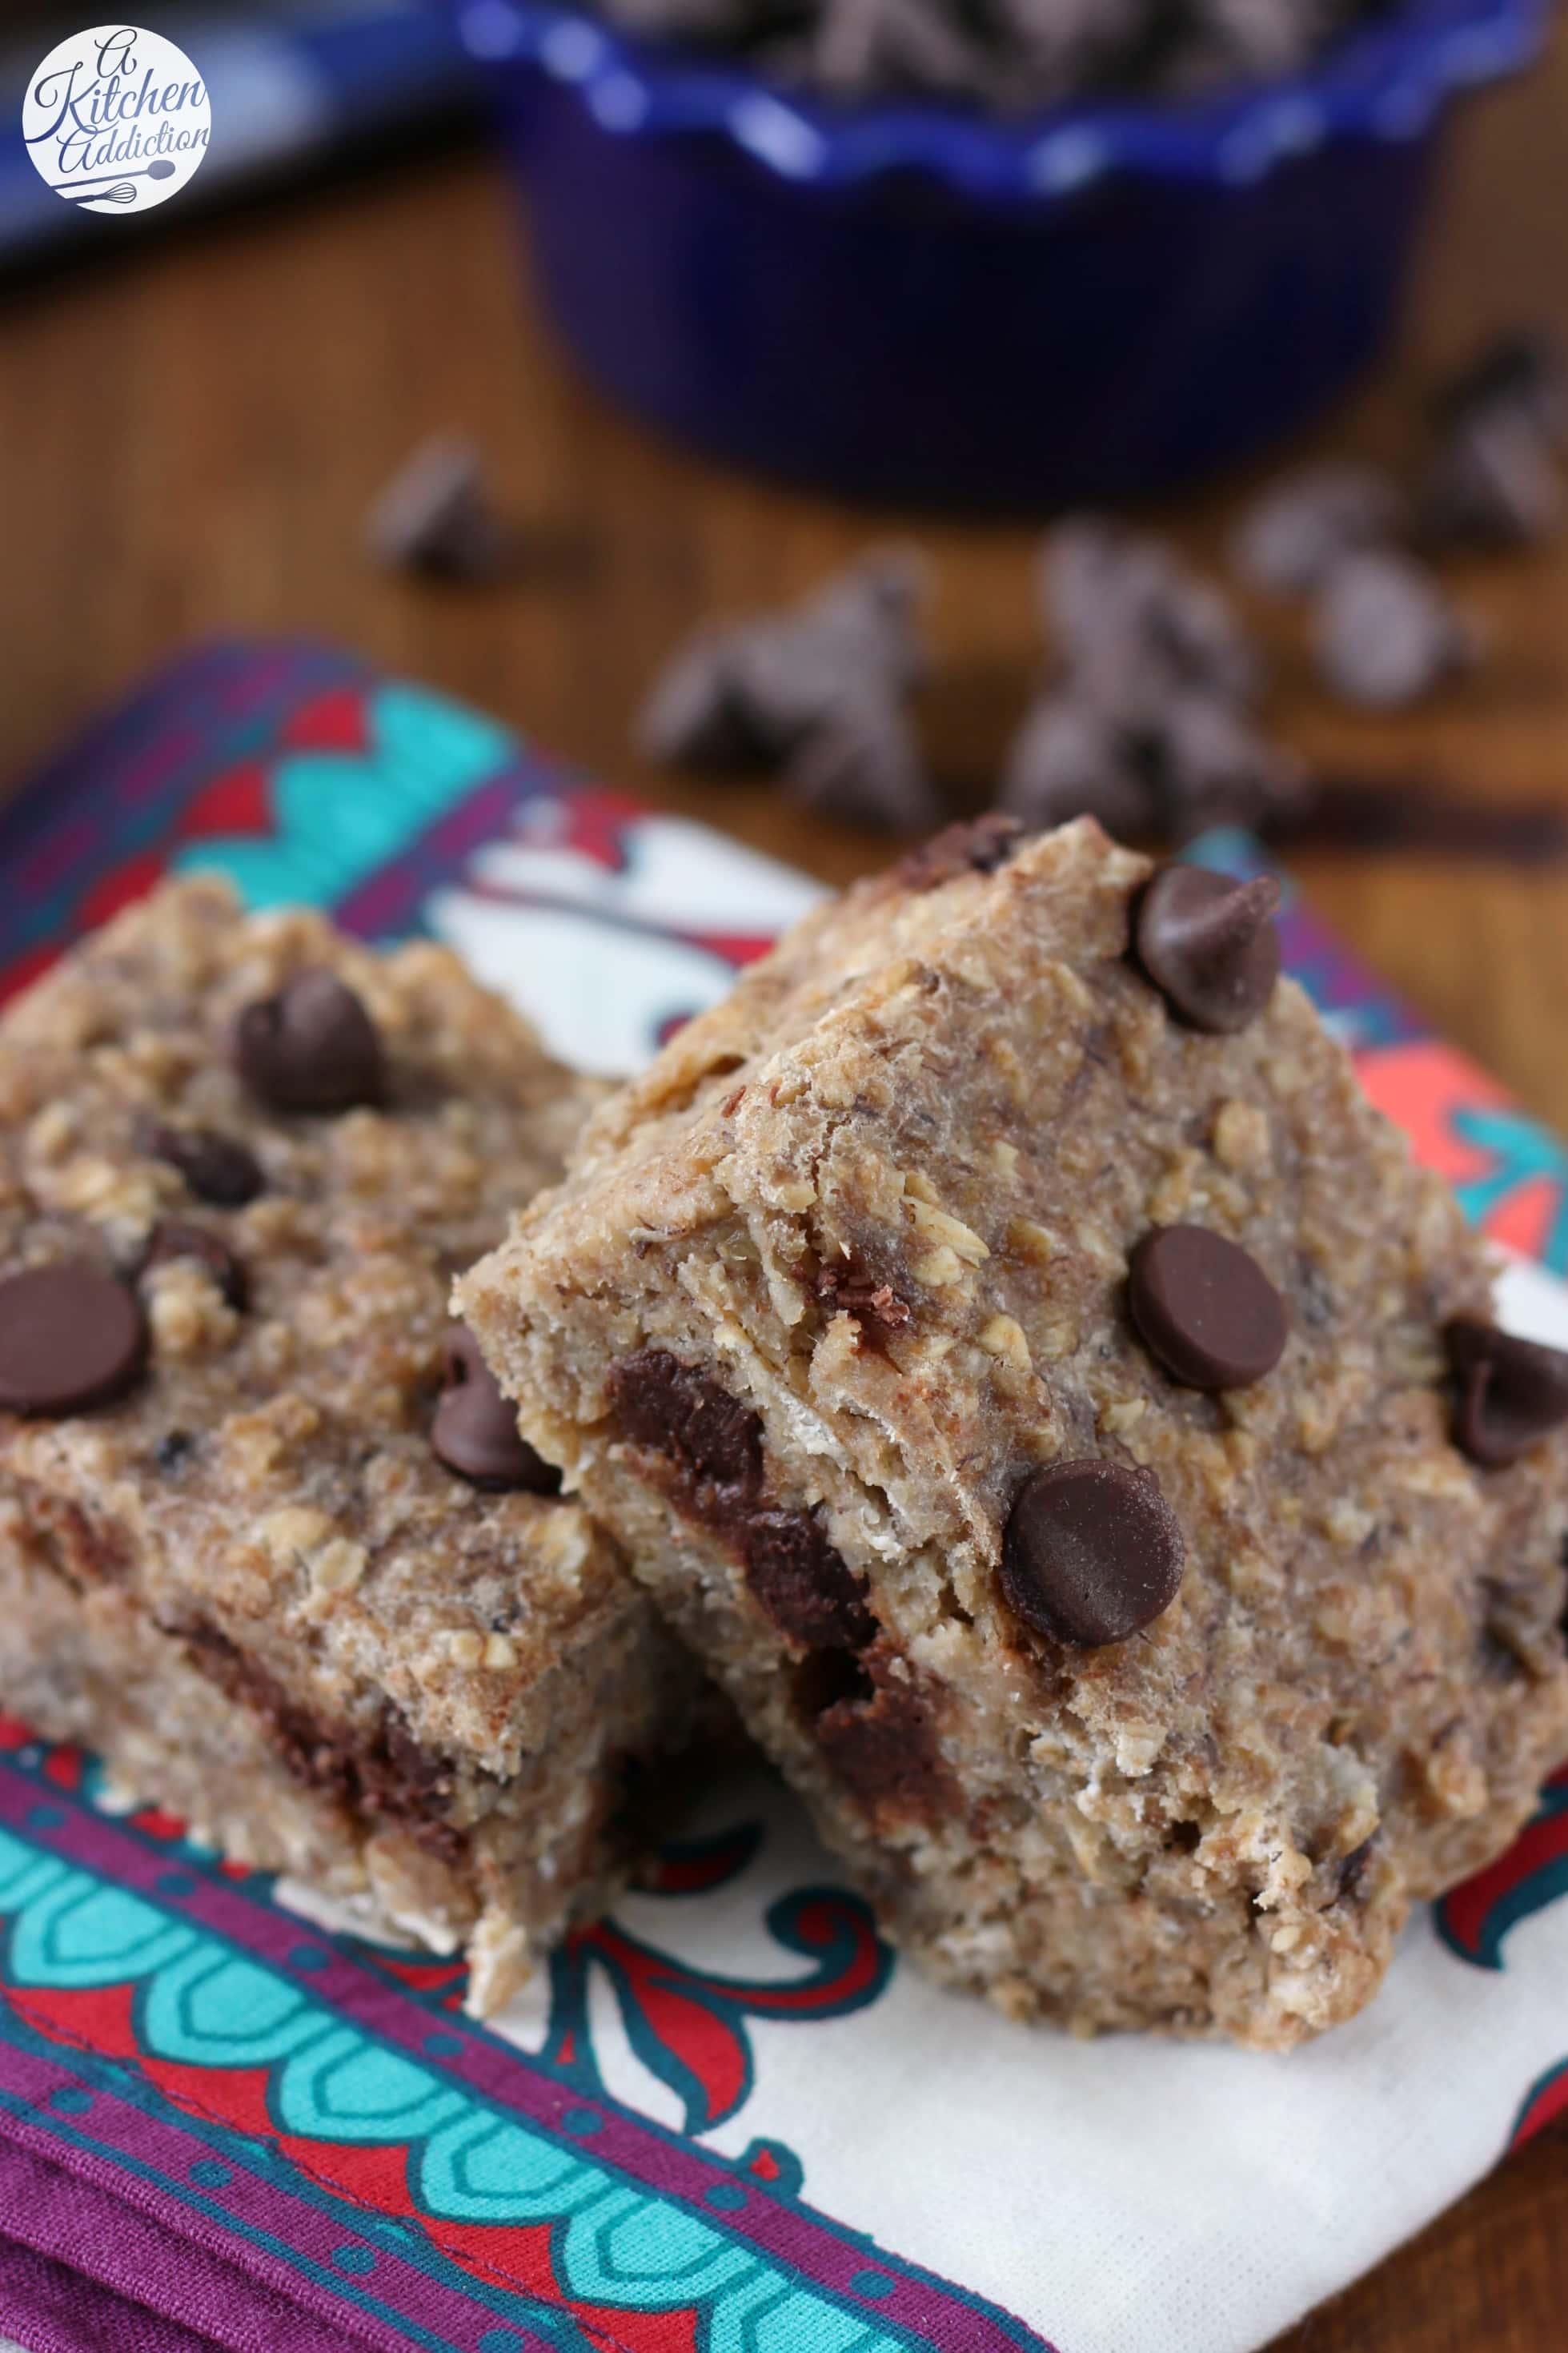 Healthier Chocolate Chip Banana Breakfast Bars Recipe from A Kitchen Addiction